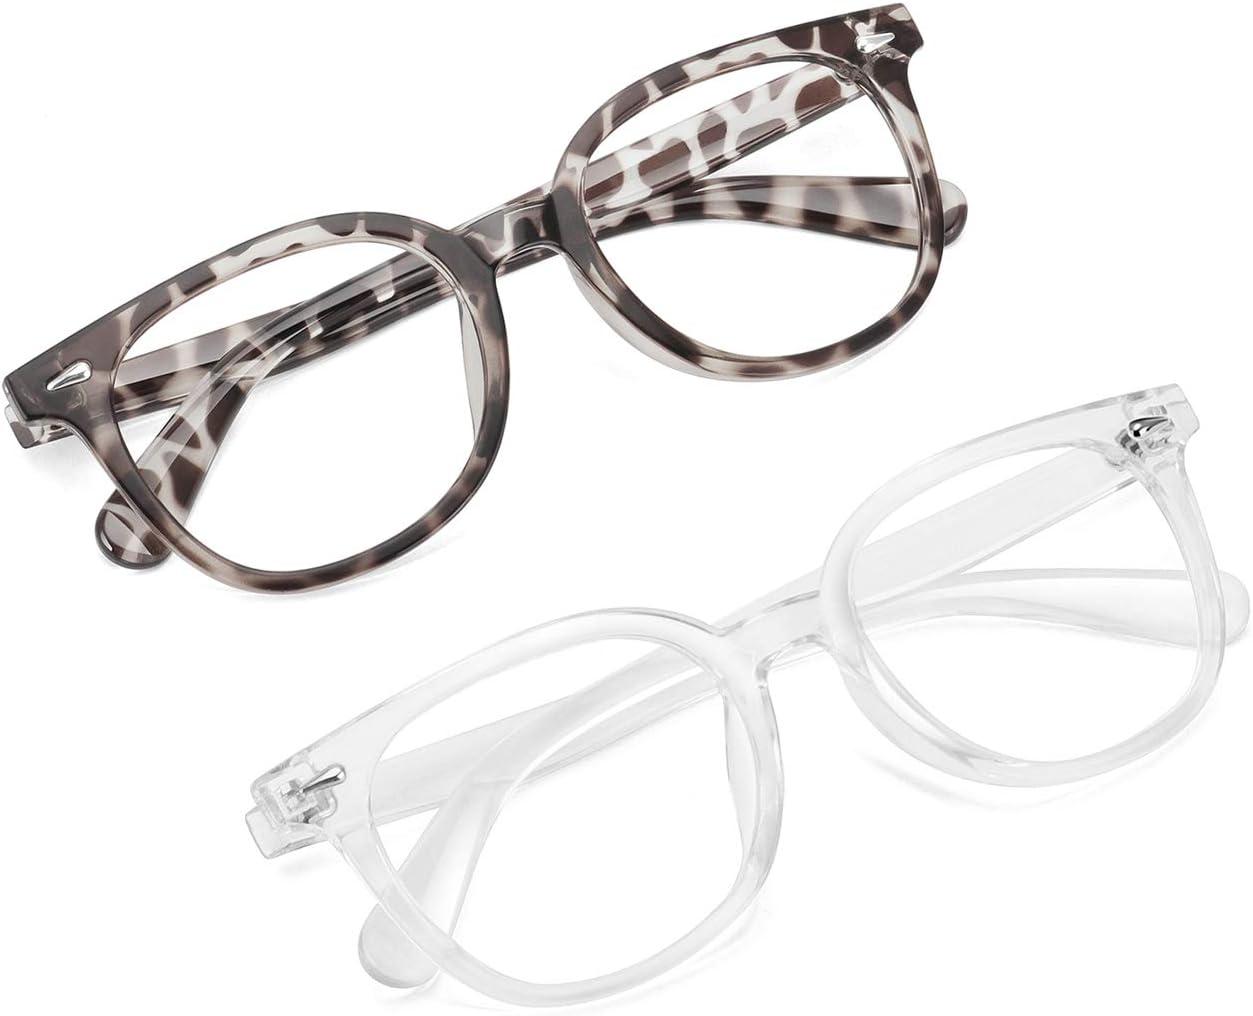 STORYCOAST Blue Light Glasses Blocking Women Anti We OFFer at cheap prices Men supreme